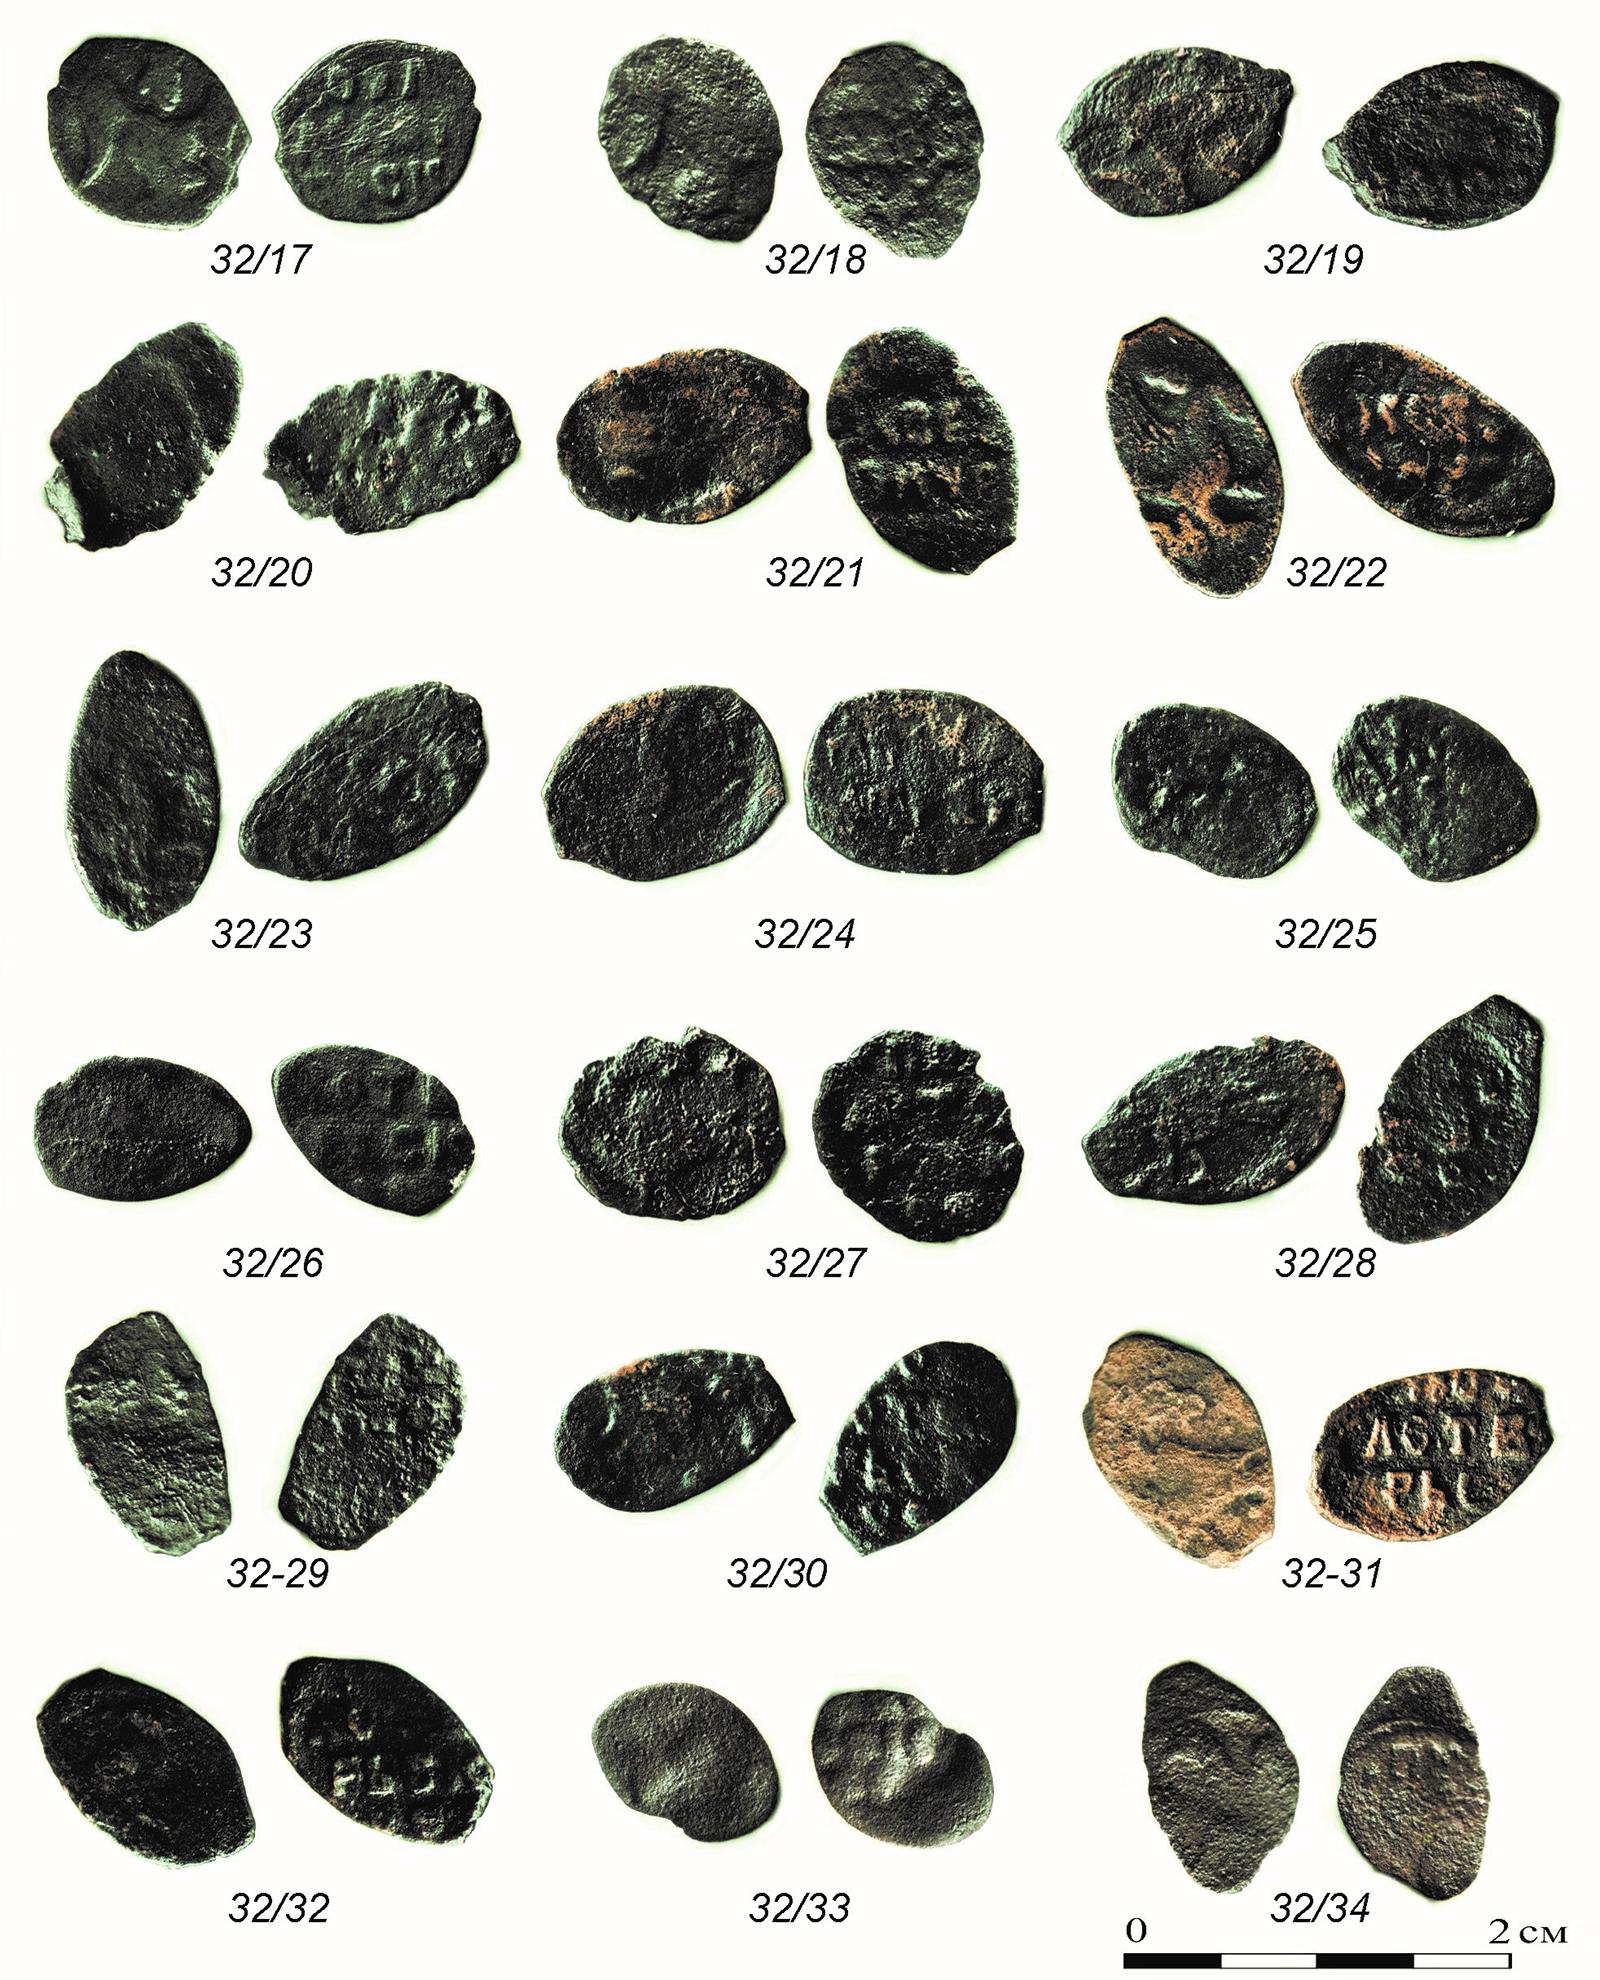 Клад русских медных монет конца XV–XVI веков